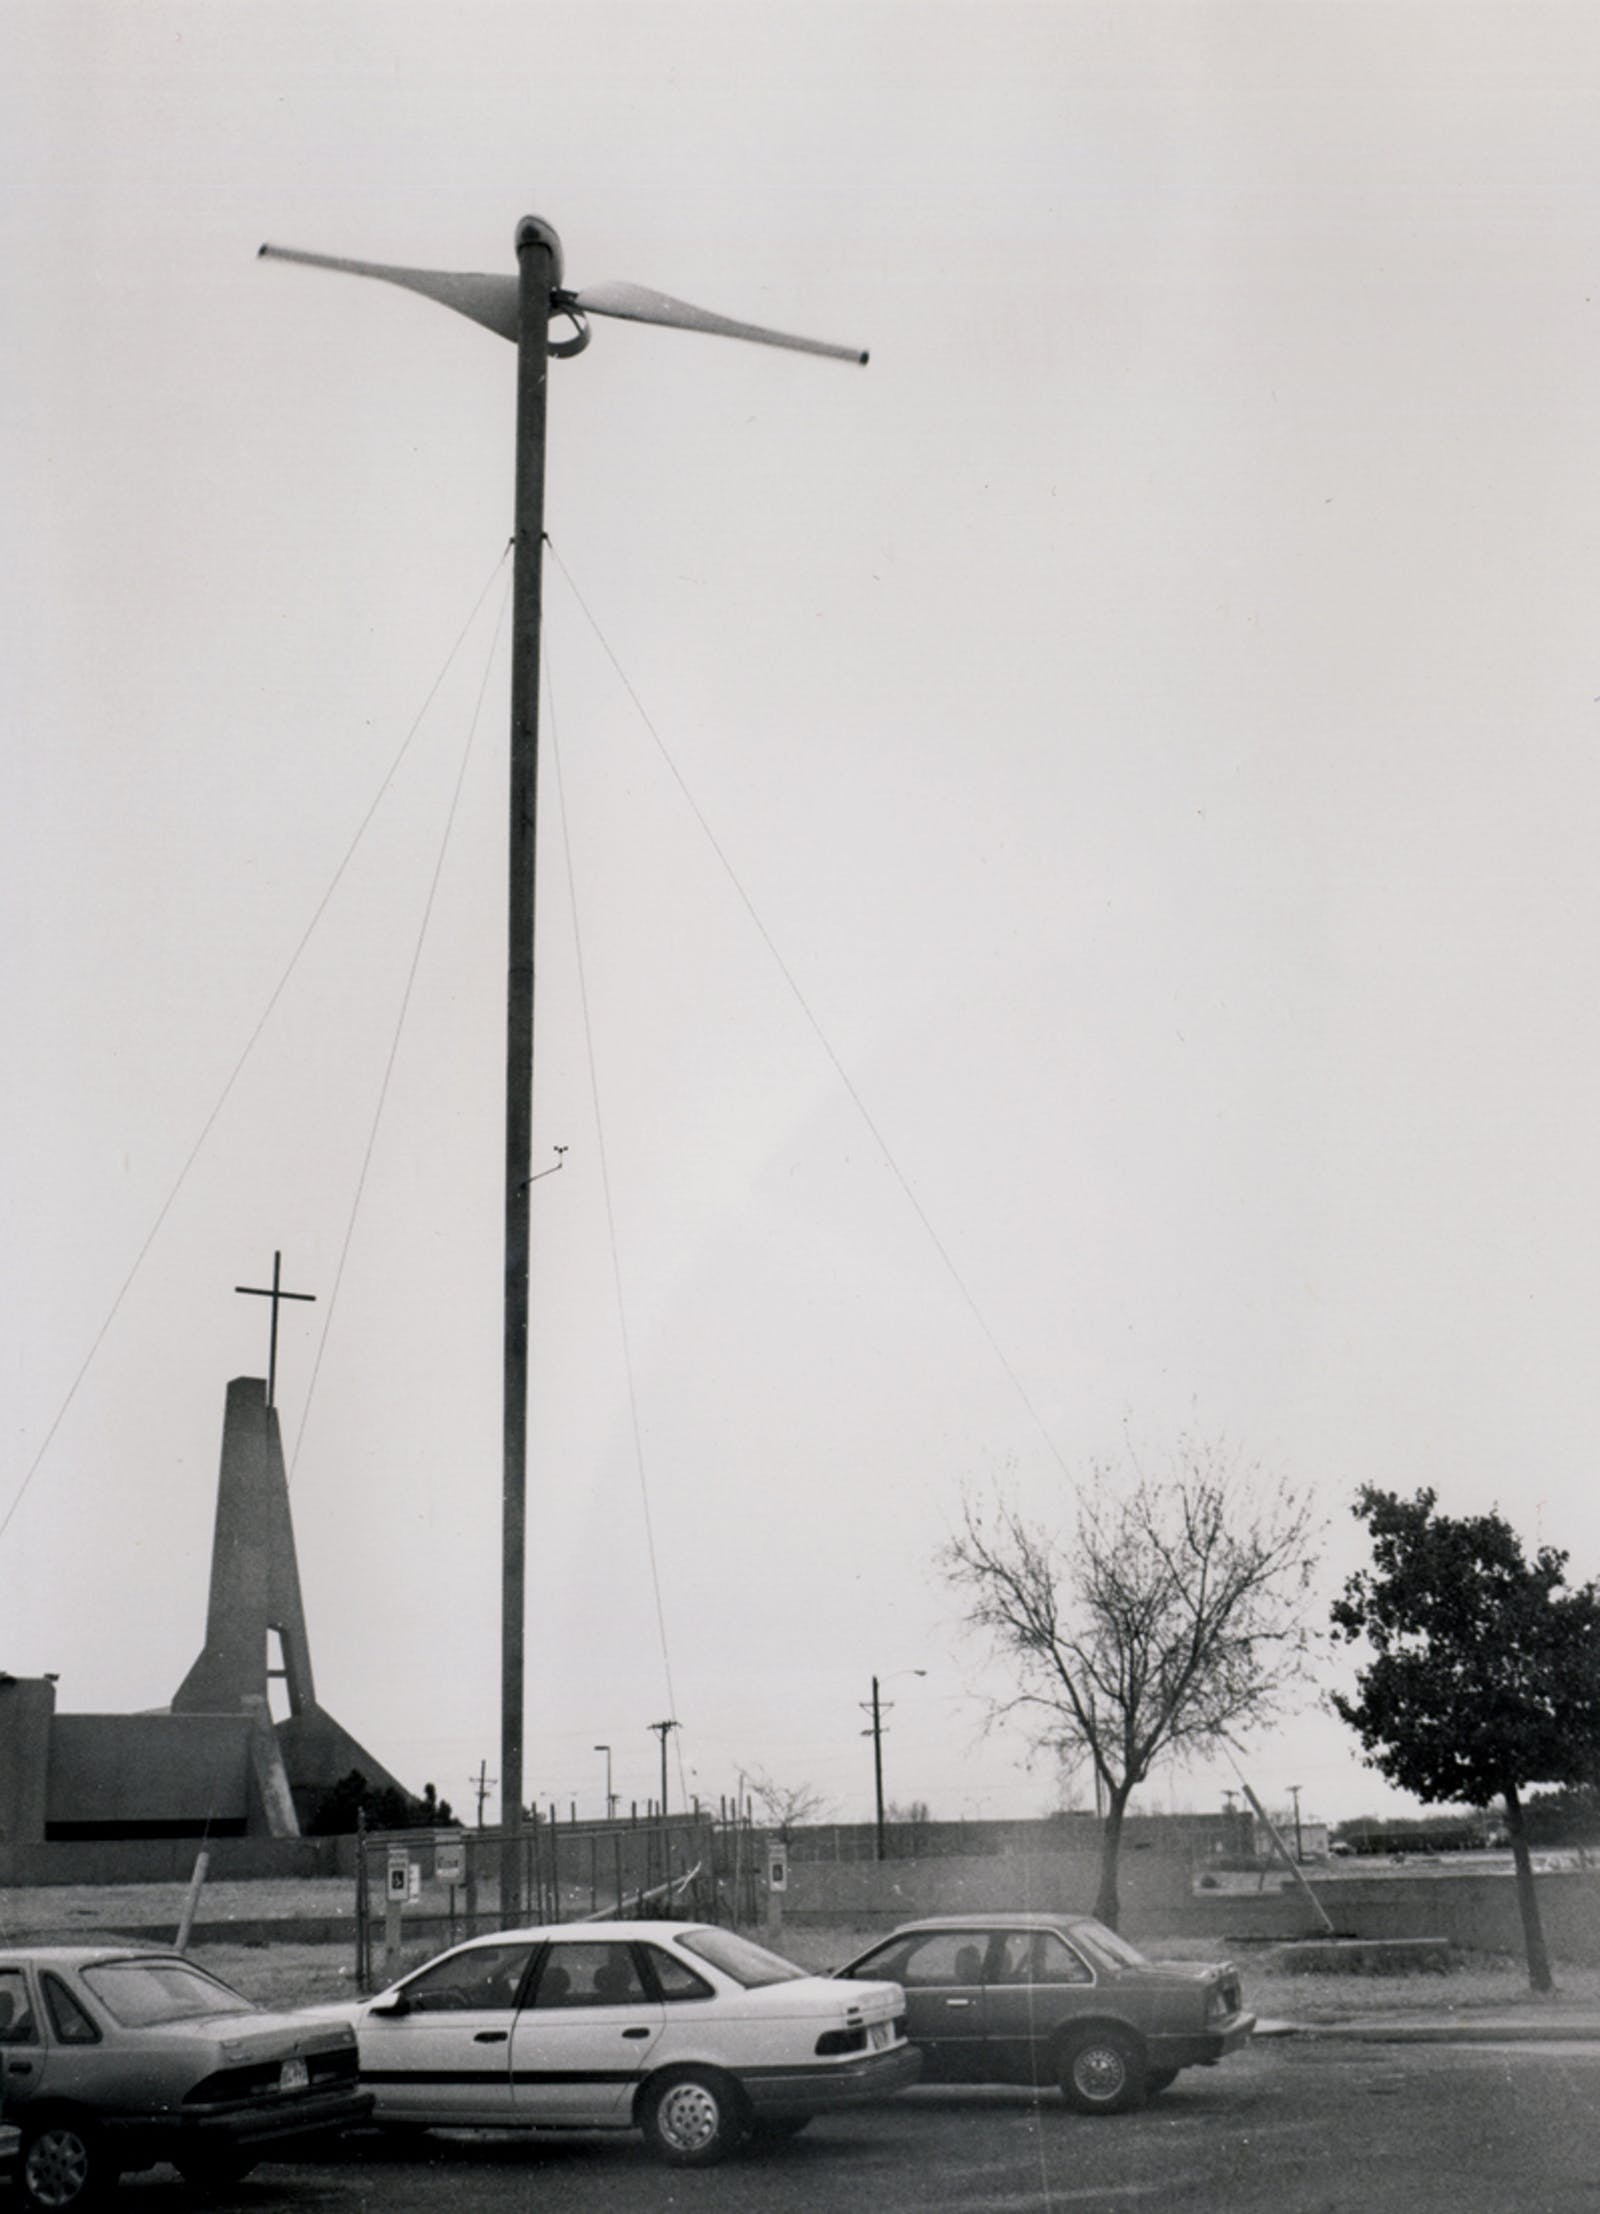 One of St. John Neumann Catholic Church's turbines in Lubbock, circa 1993.